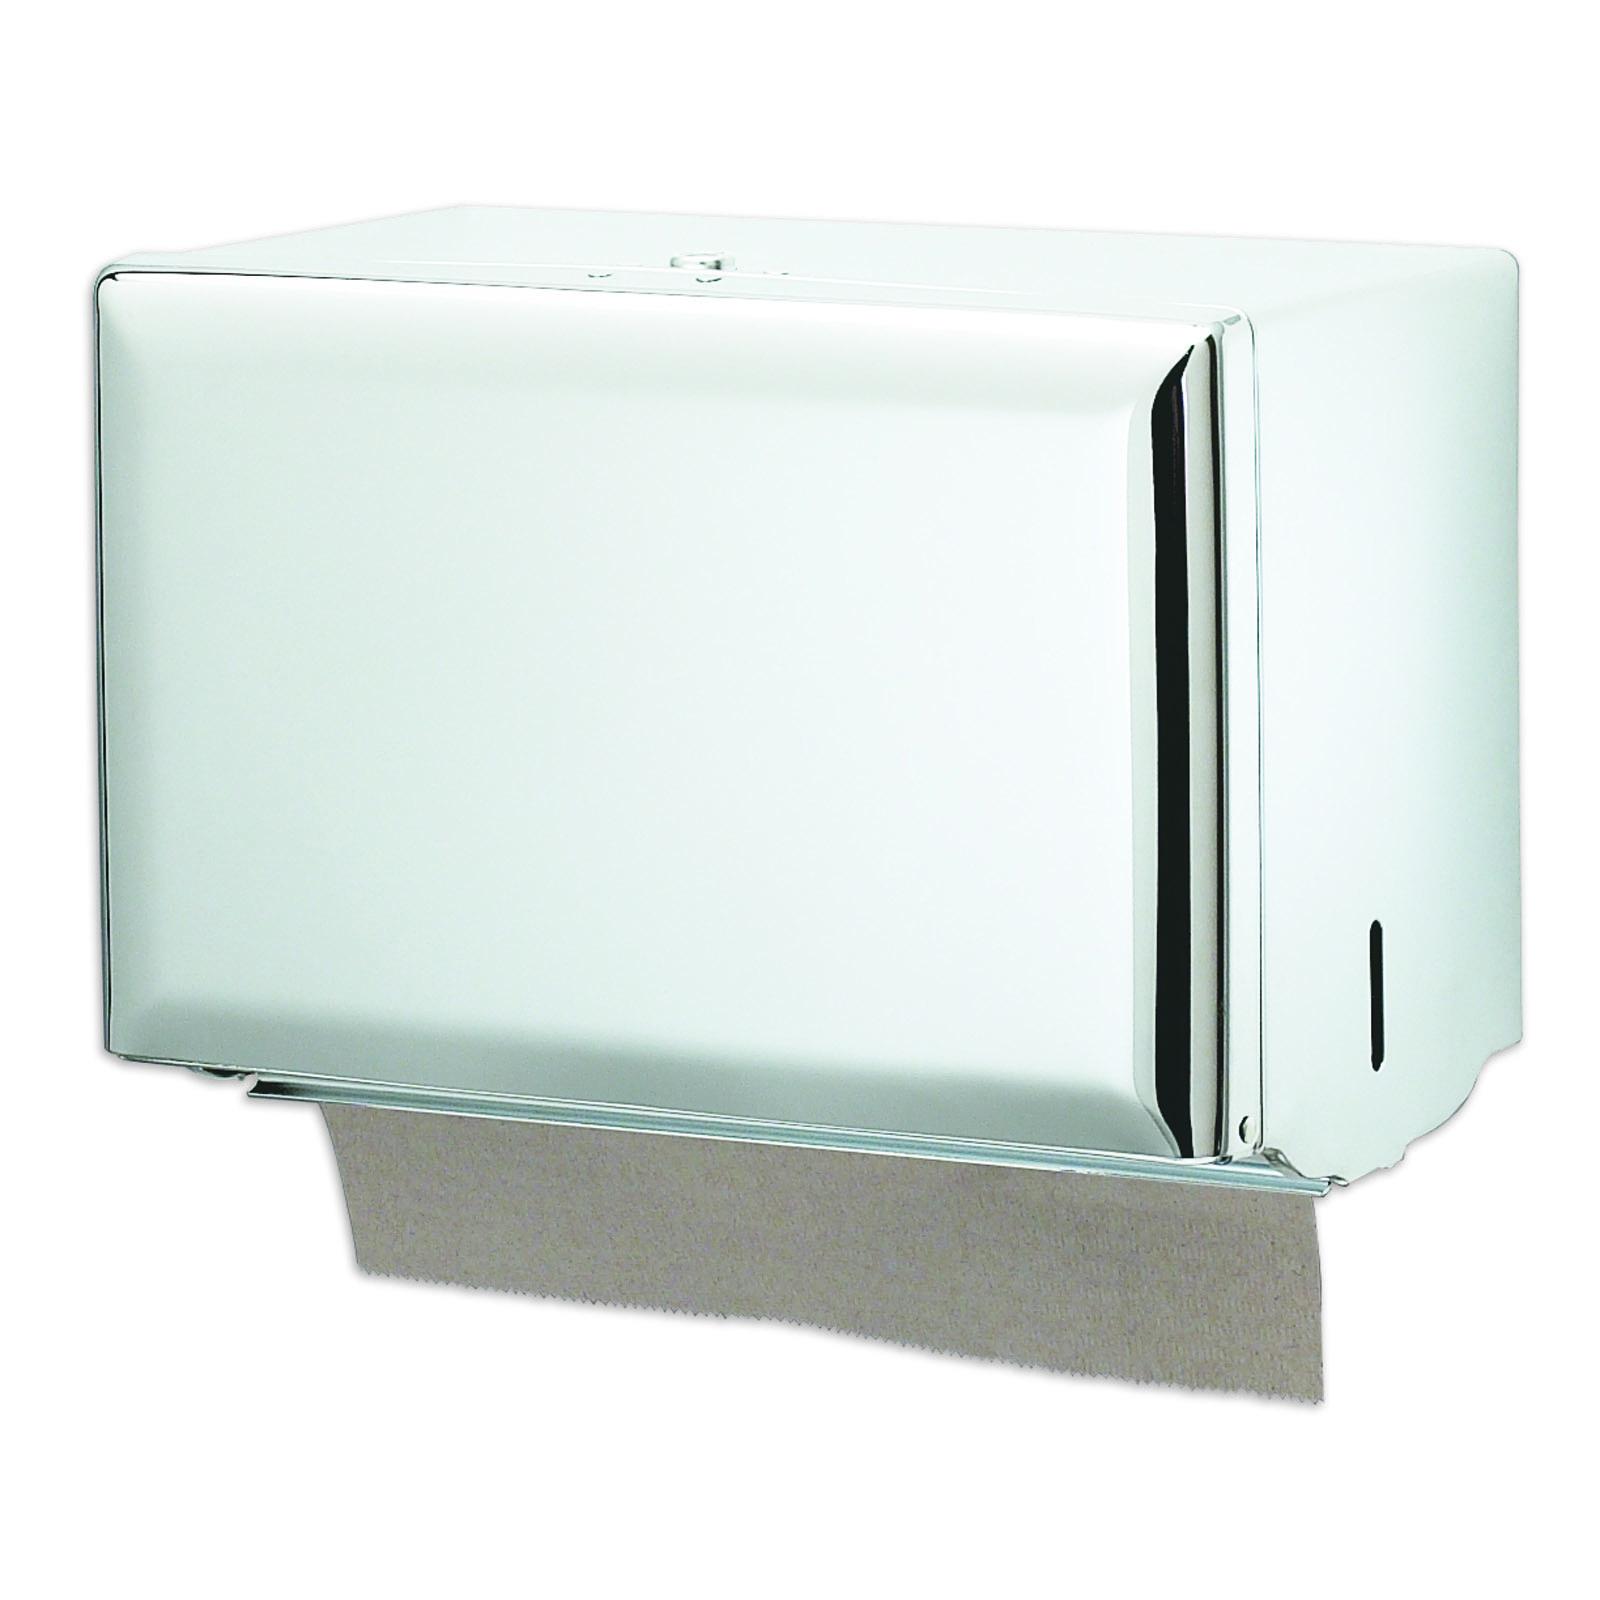 San Jamar T1800WH paper towel dispenser